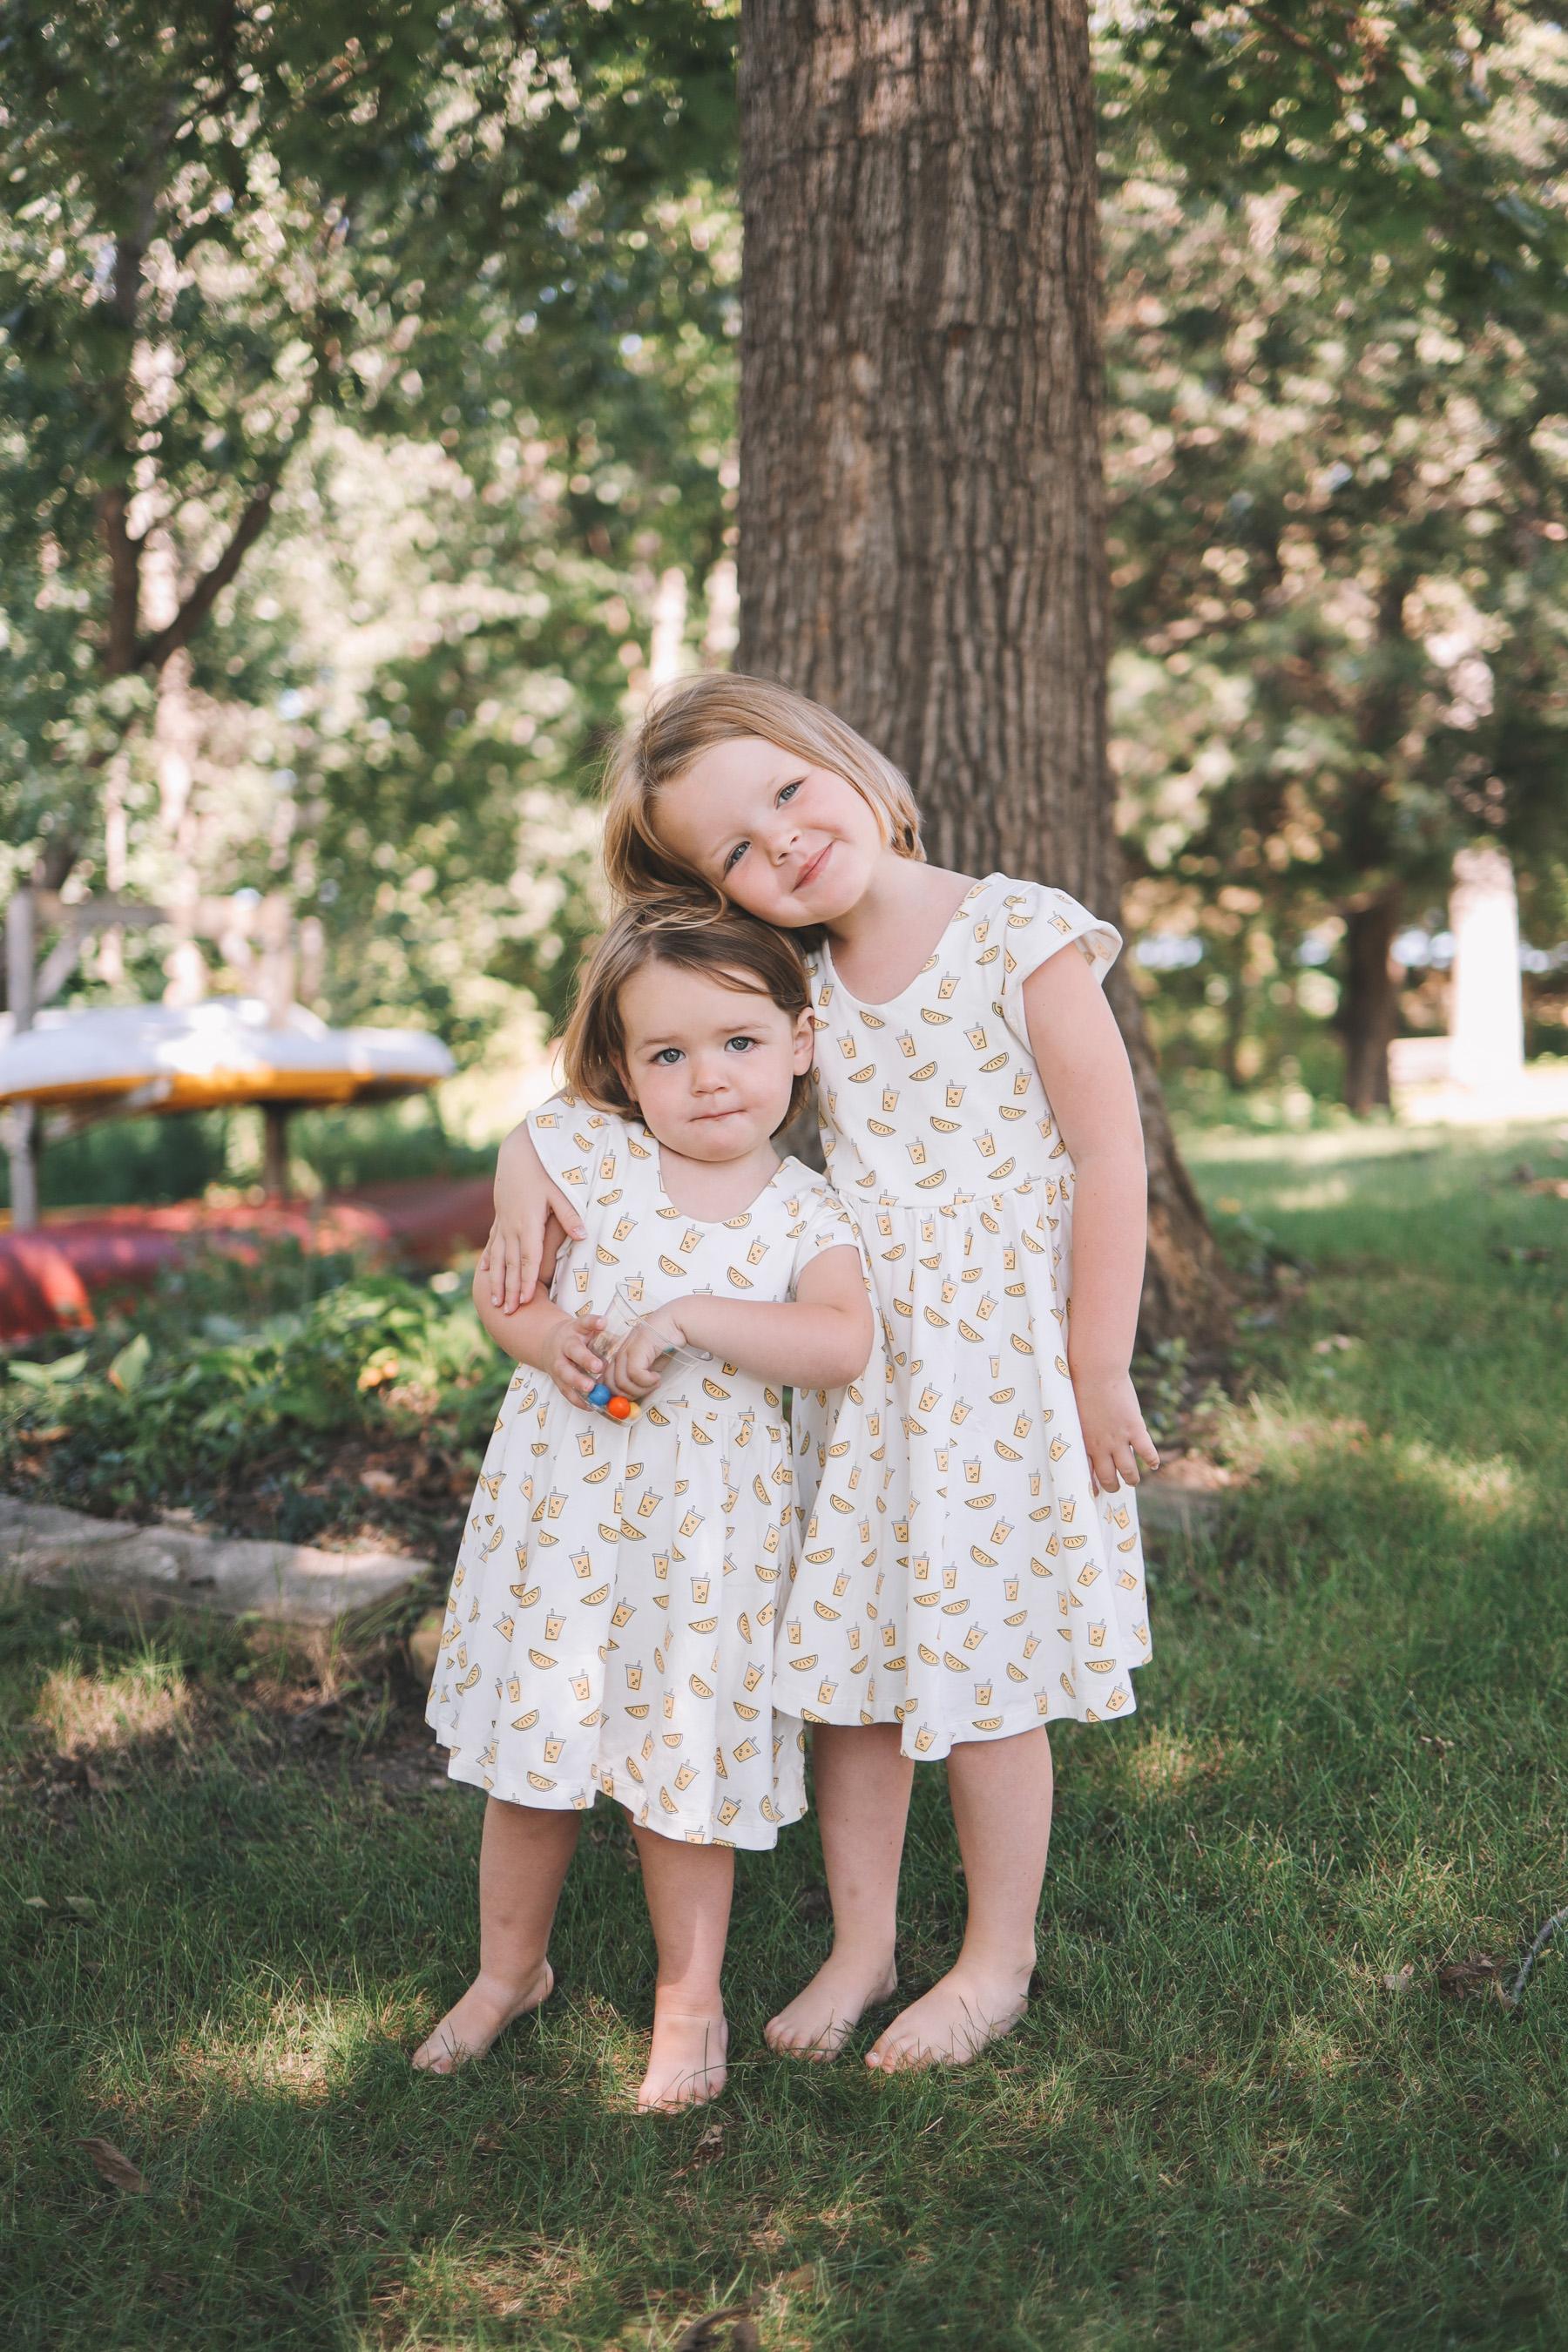 Lemon Dresses to Benefit Pediatric Cancer Research